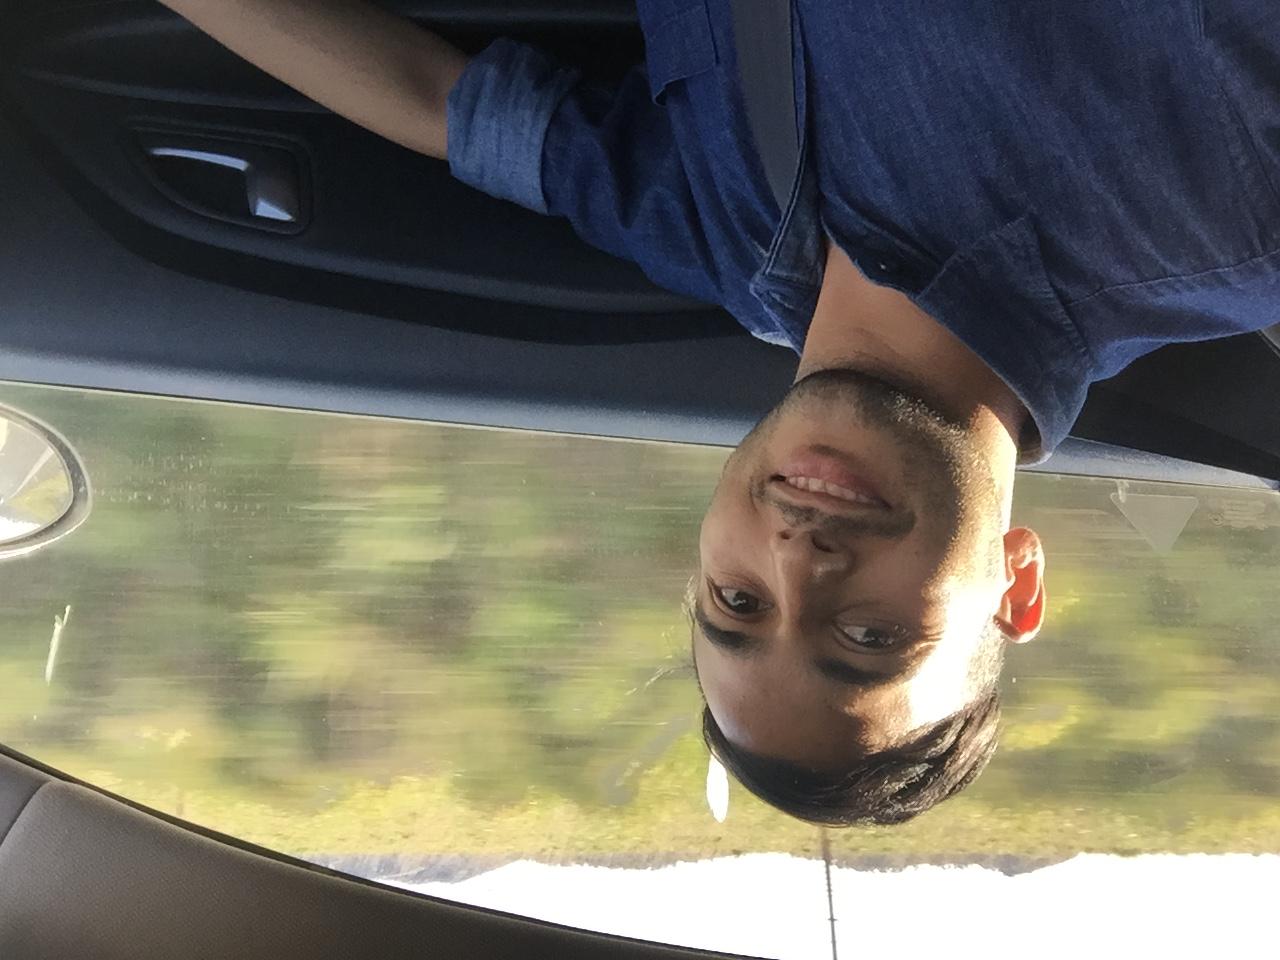 Prashant's profile picture